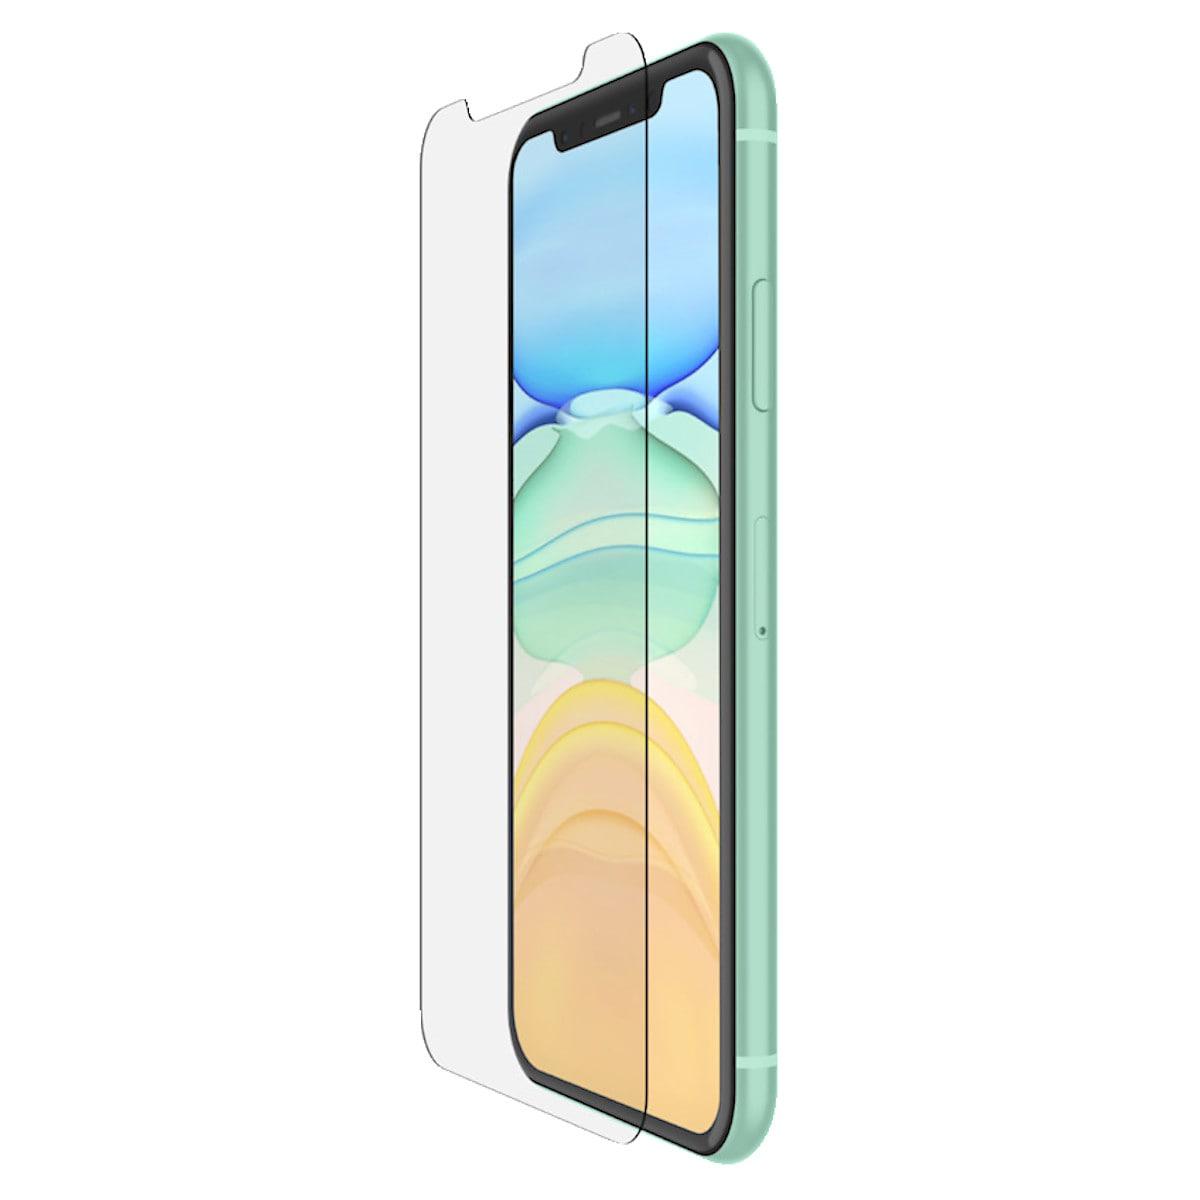 Näytönsuoja iPhone 11 / XR, Belkin ScreenForce Tempered Glass